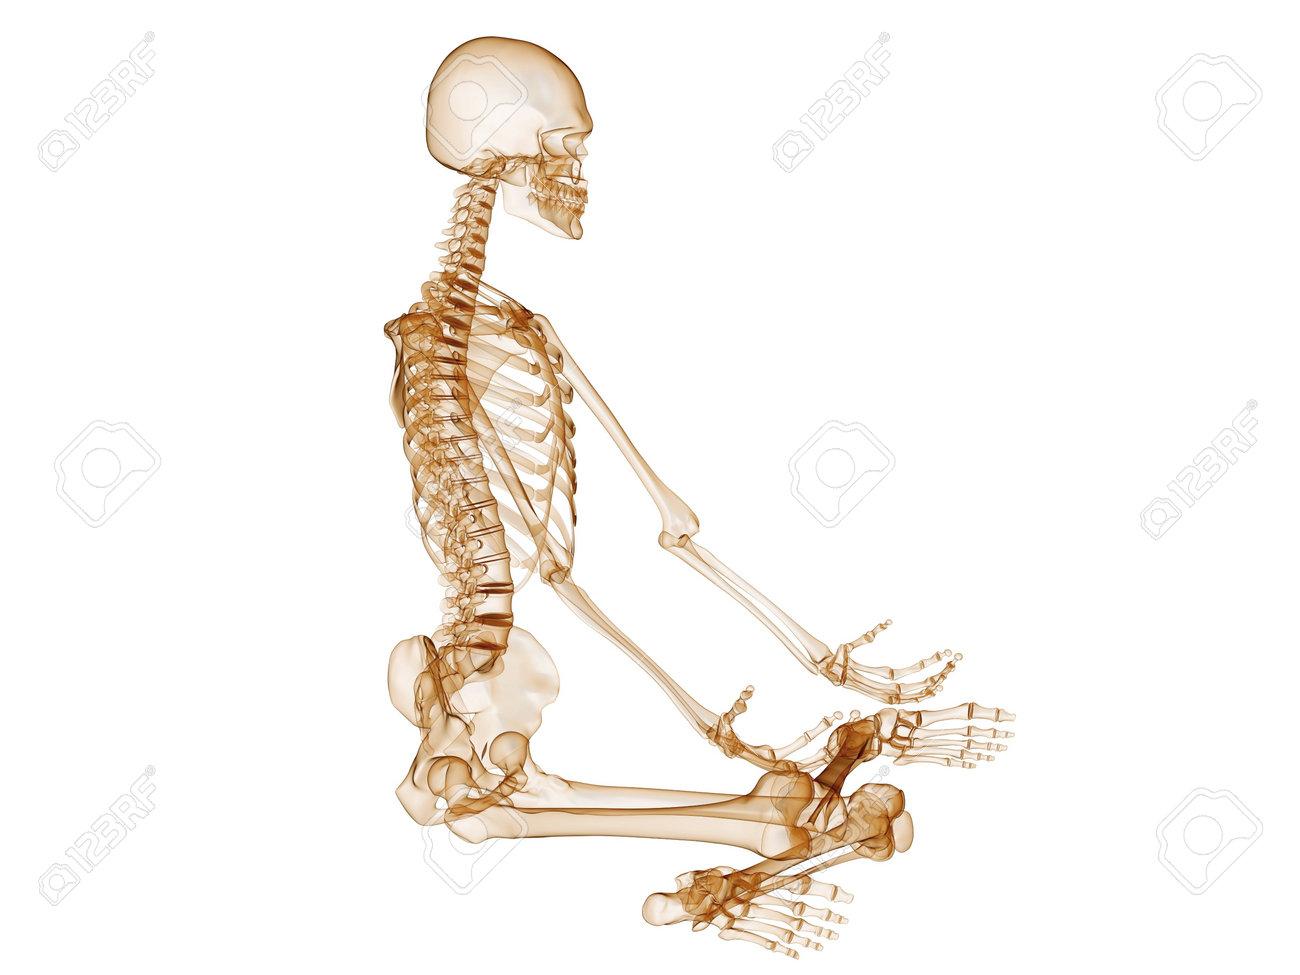 pic of human skeleton – lickclick, Skeleton